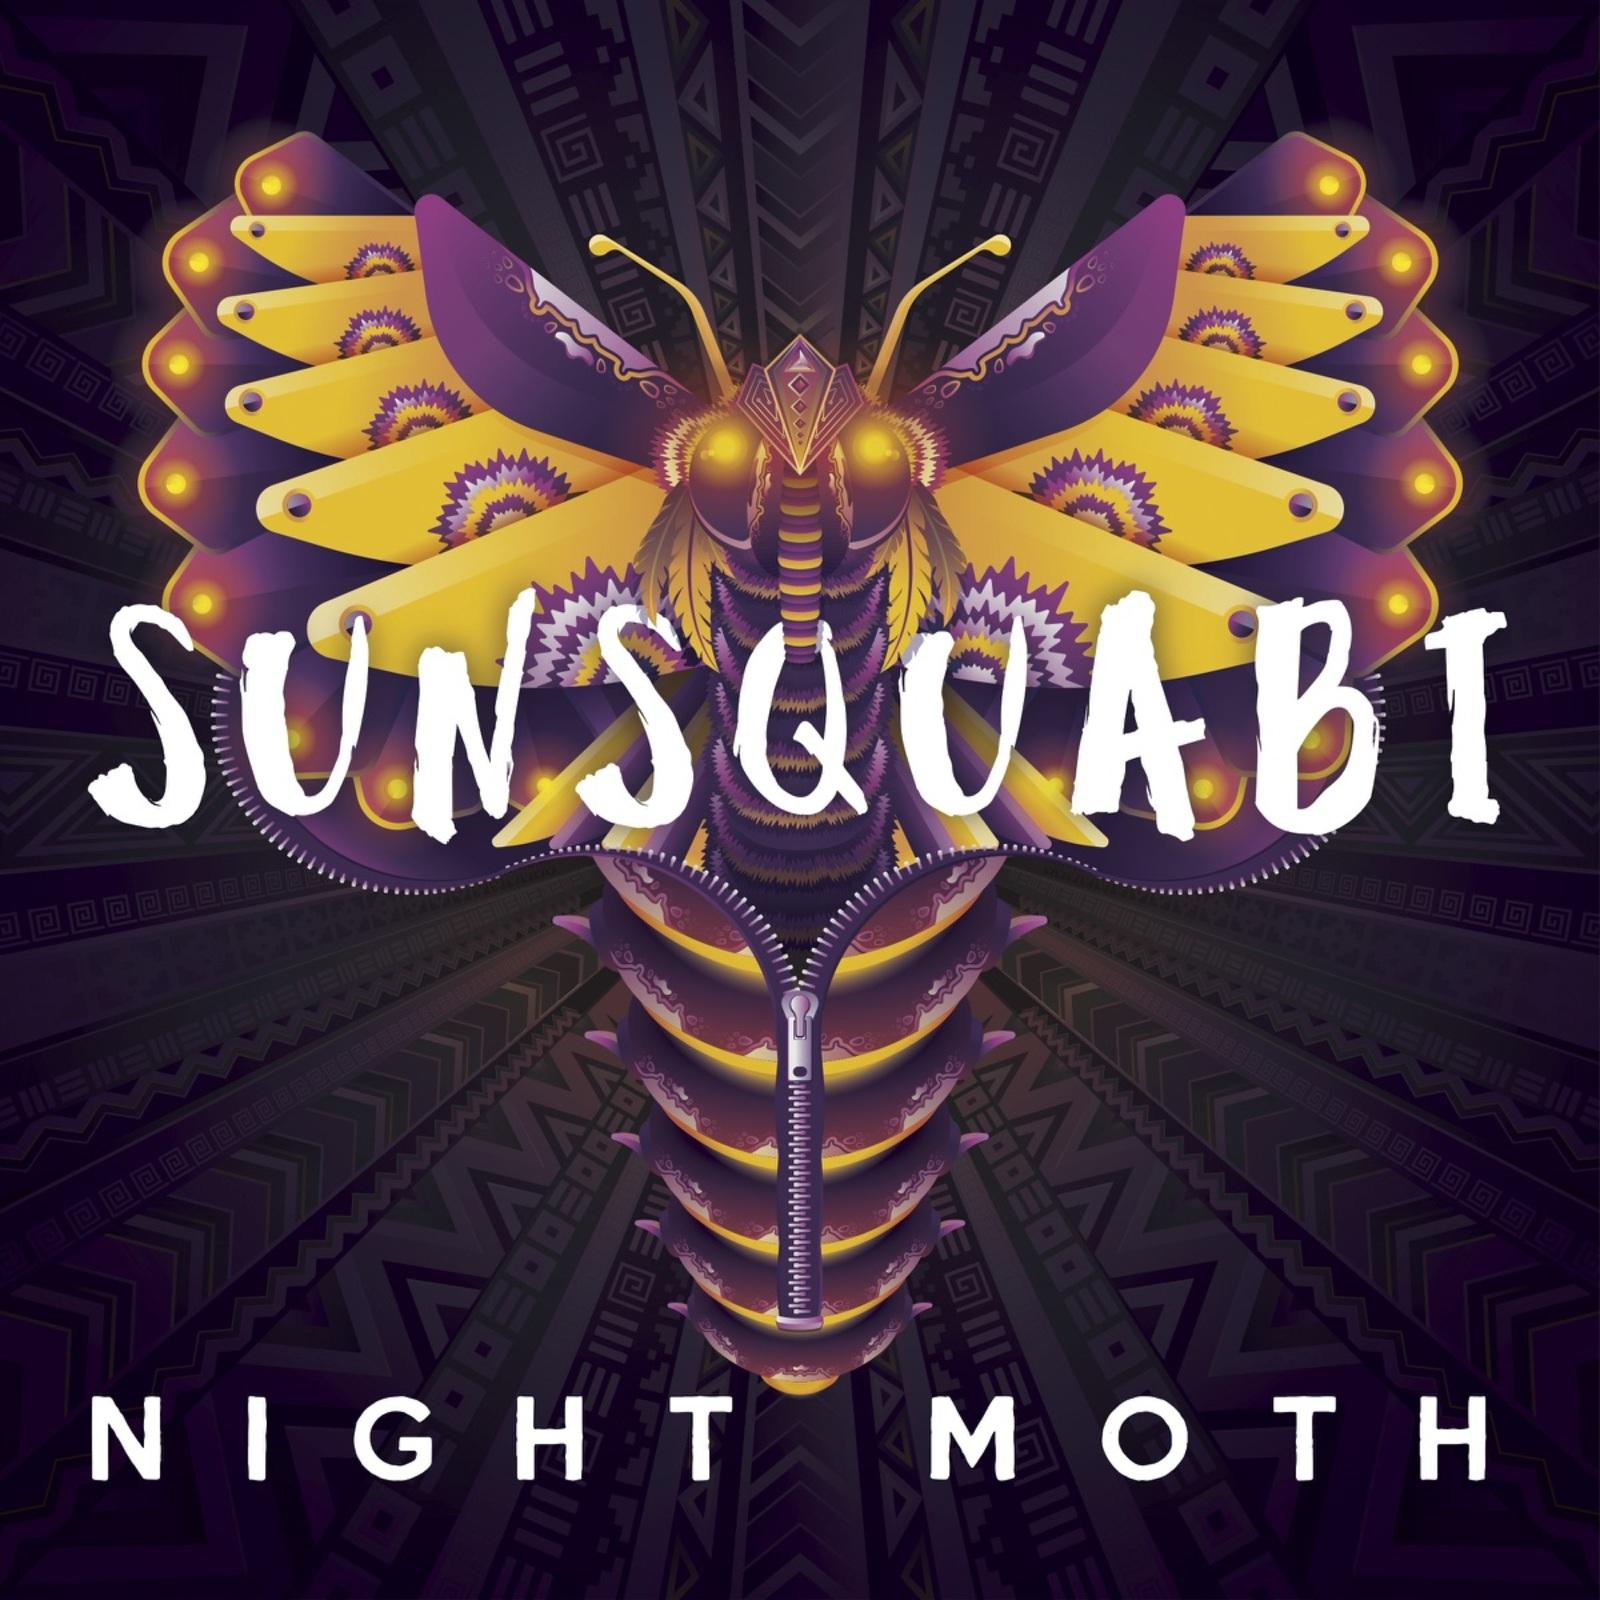 sunsquabi night moth art